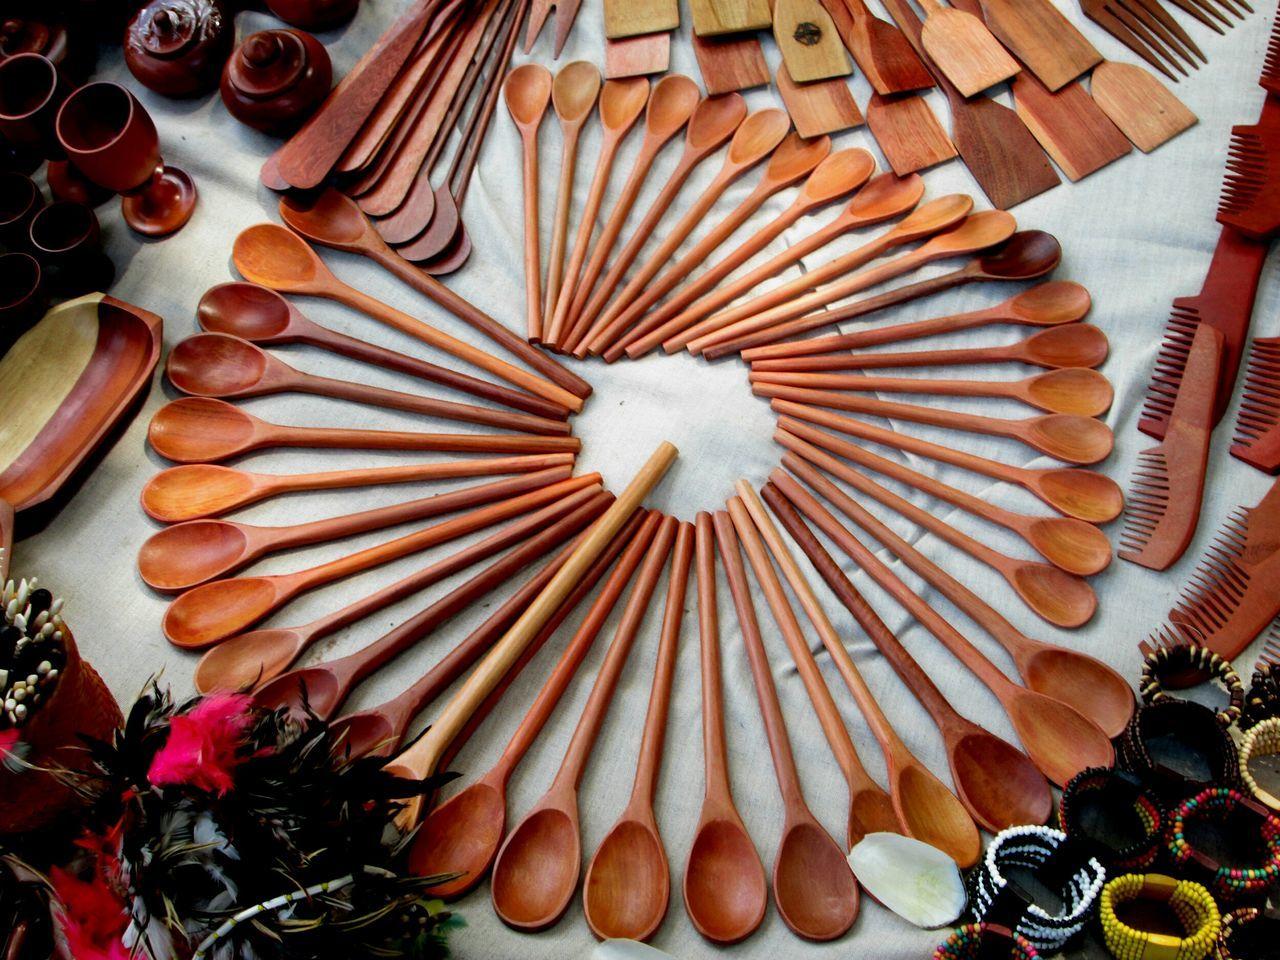 Arte indígena!!! Riodejaneiro RJ Errejota  Parquelage Indios Artesanato EyeEm Eye4photography  Indian Culture